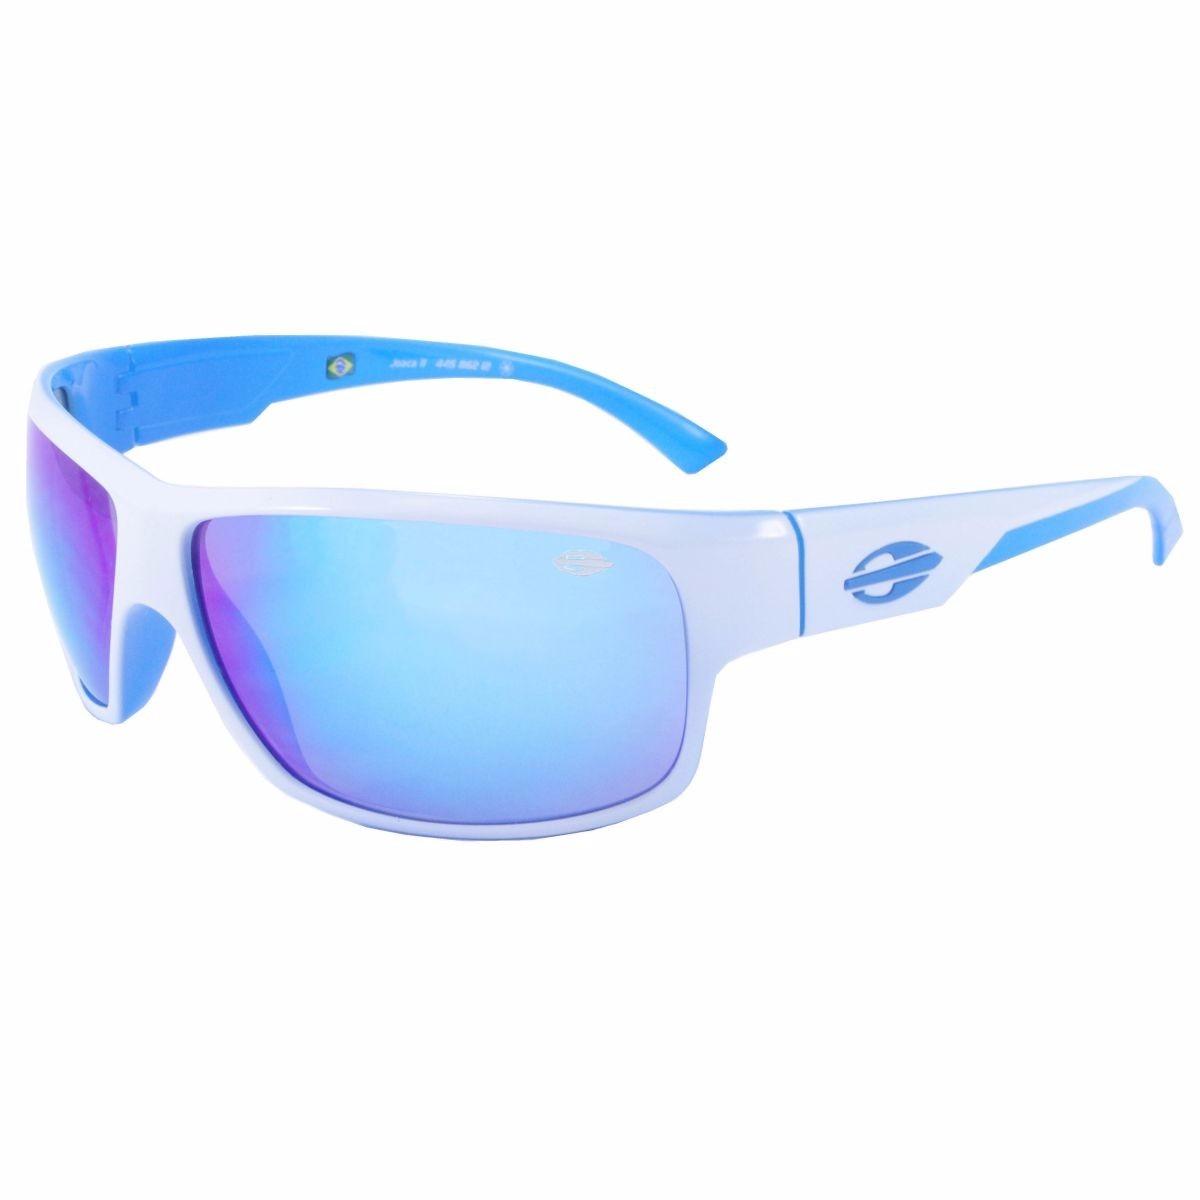 Óculos De Sol Mormaii Joaca Ii 445 862 12 - R  199,00 em Mercado Livre 727adeed61